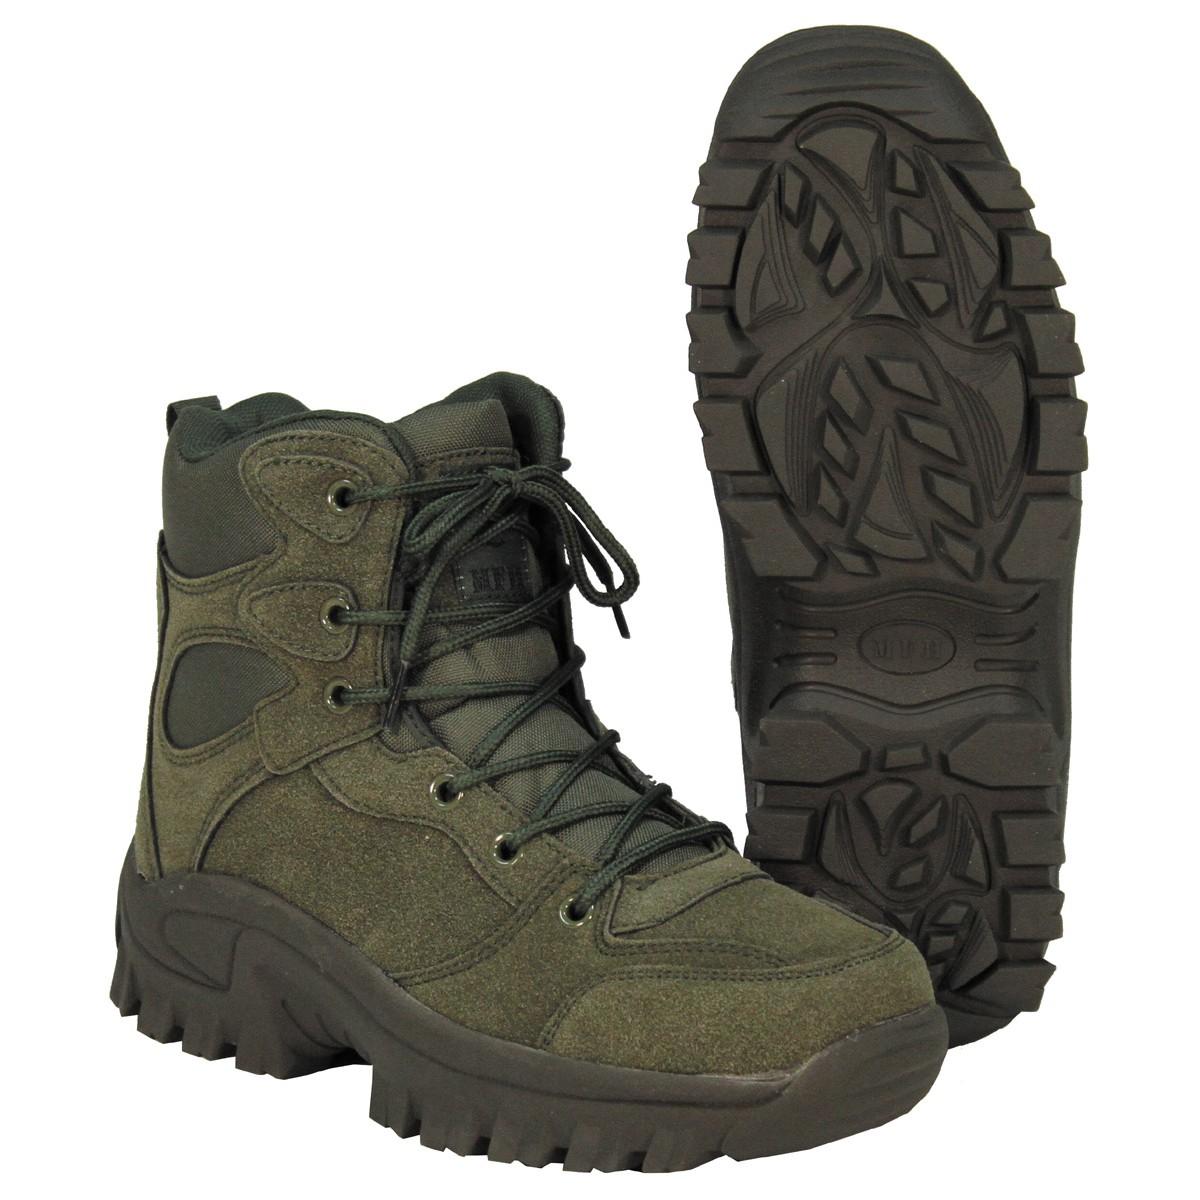 1251c23942 Členková obuv MFH Commando - OLIVA